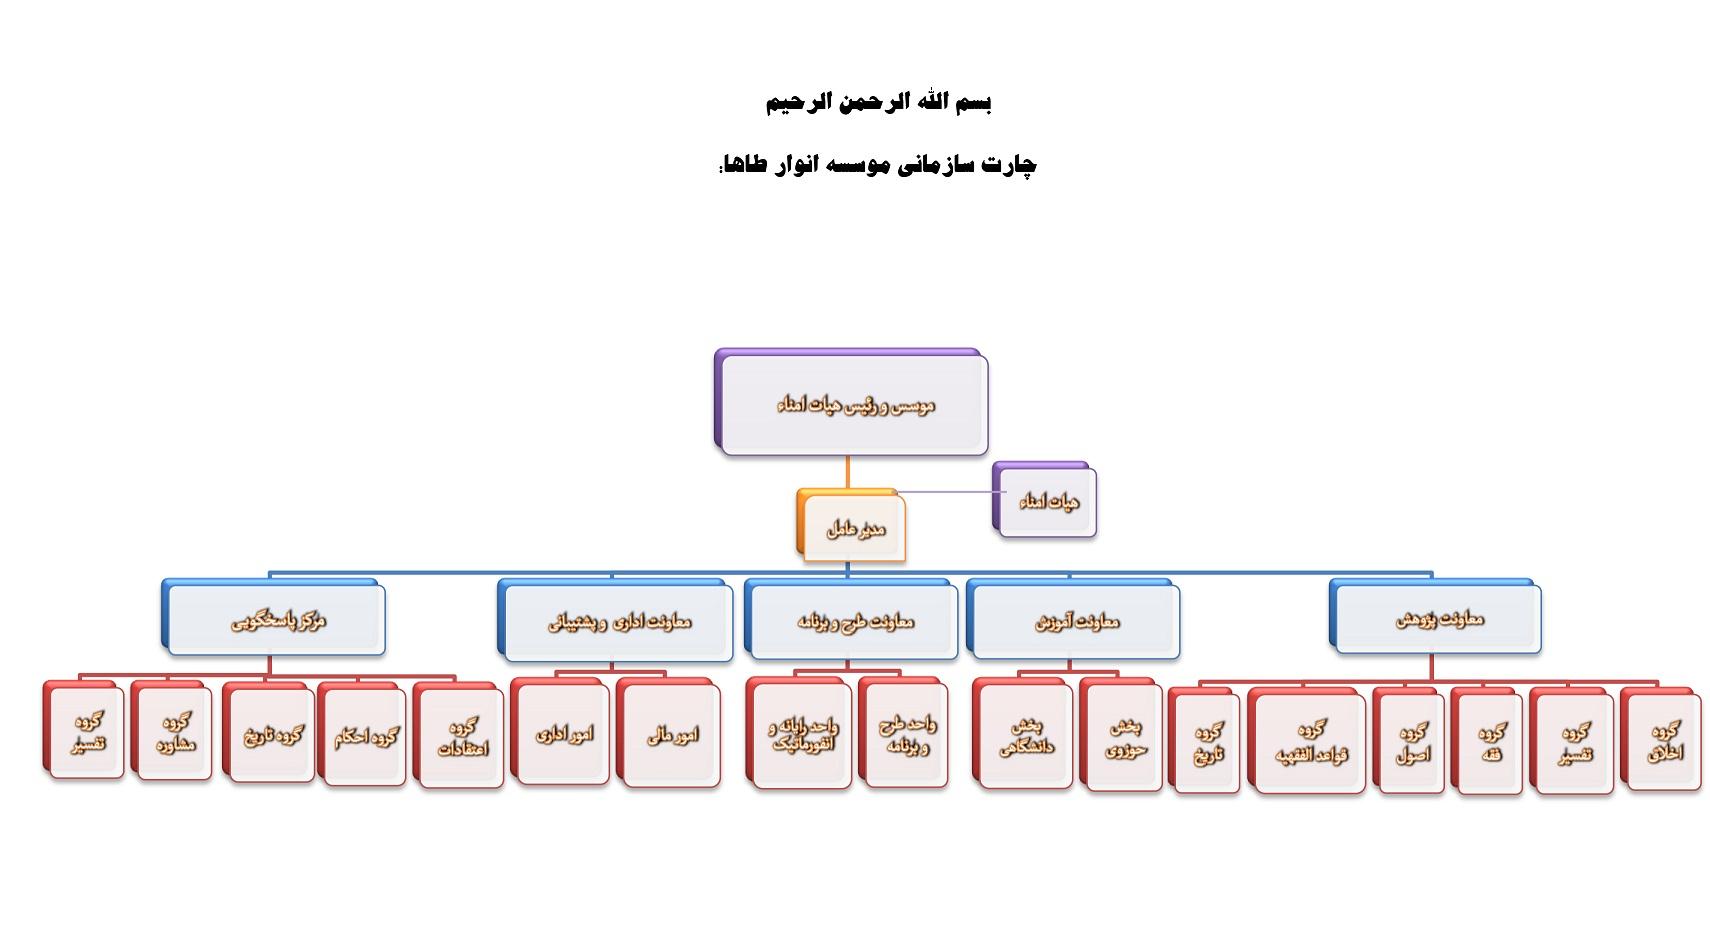 http://www.bushehri.net/images/menu-moassese/23.jpg